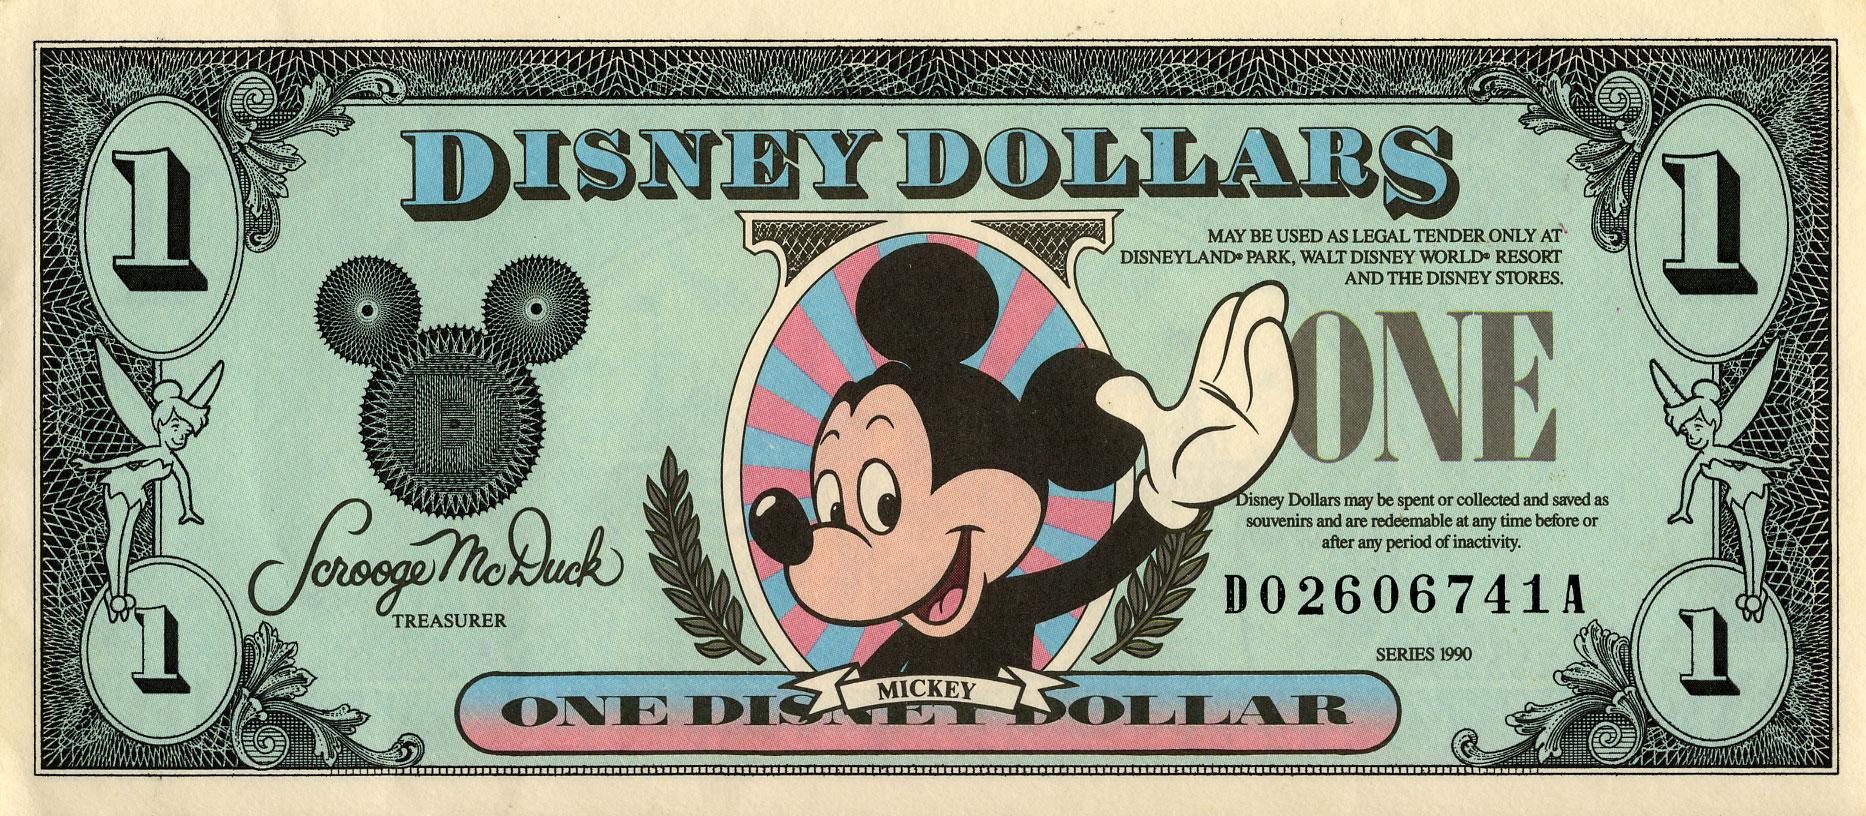 Travailler à Disneyland Paris - argent